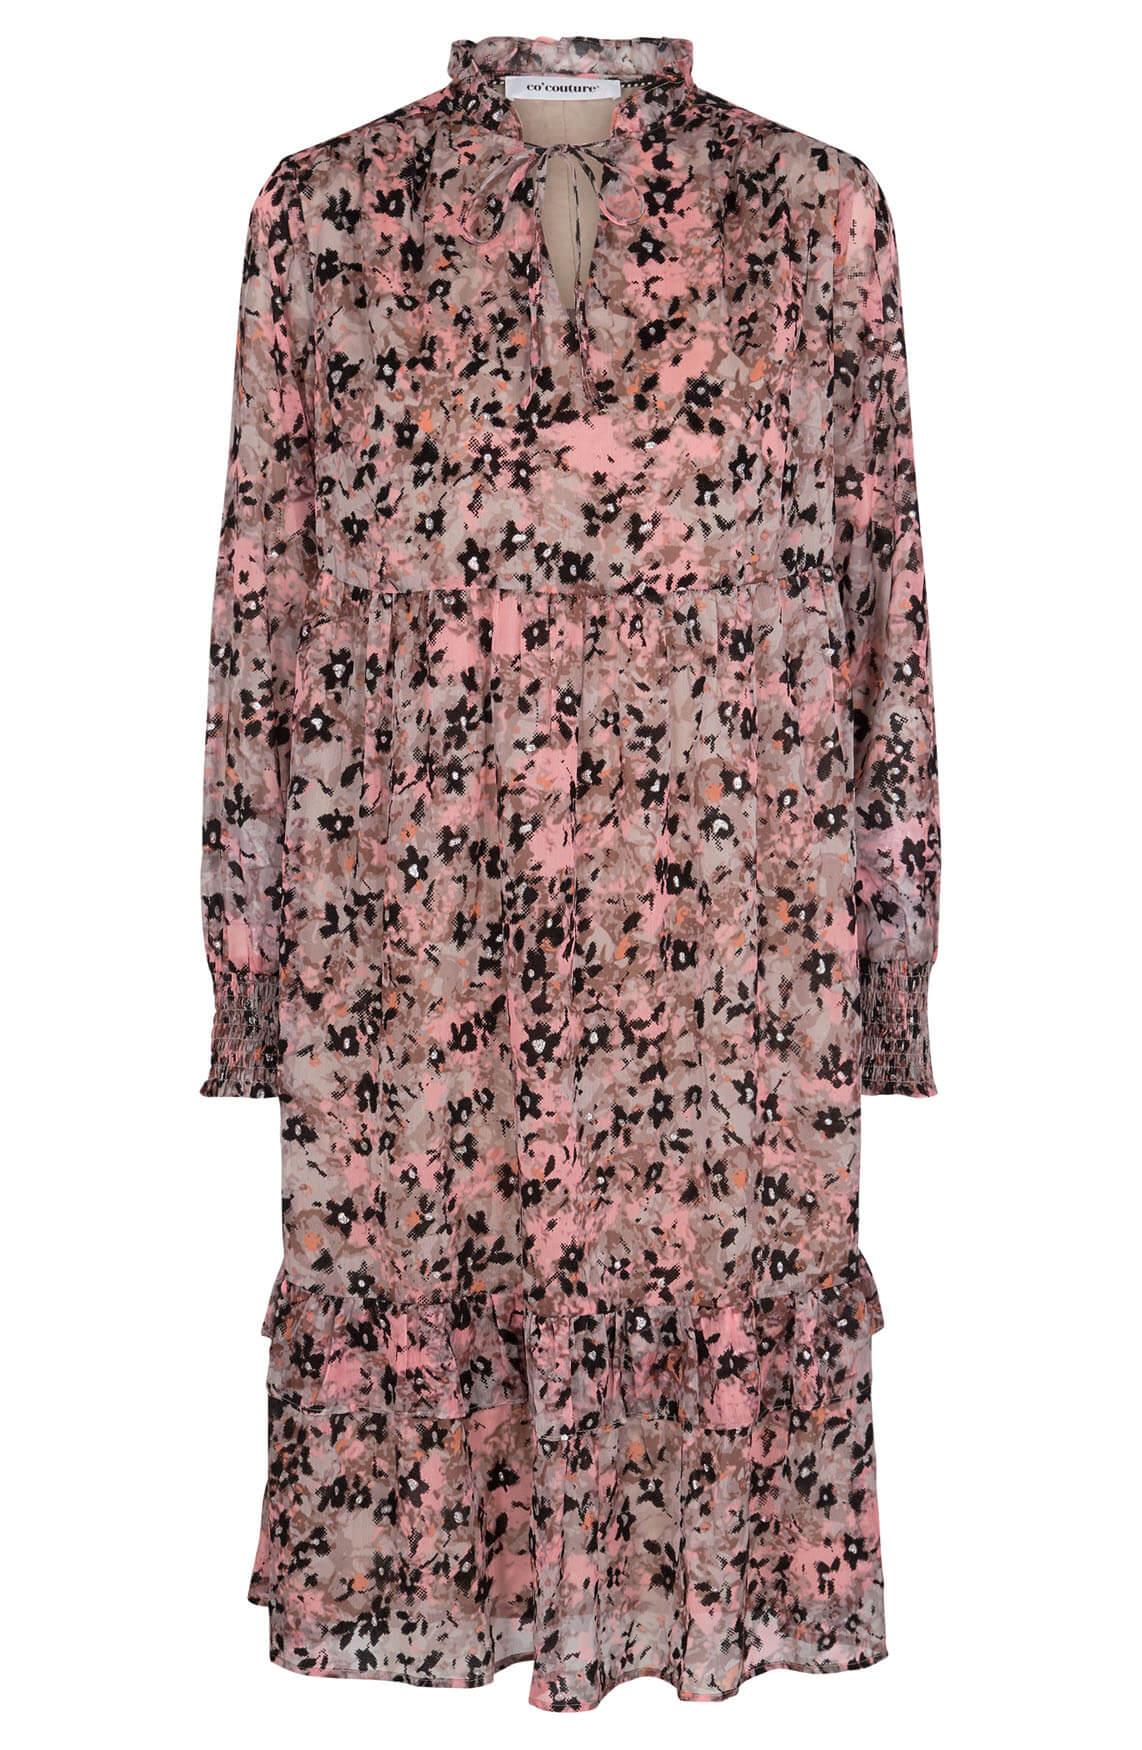 Co Couture Dames Gemma jurk roze